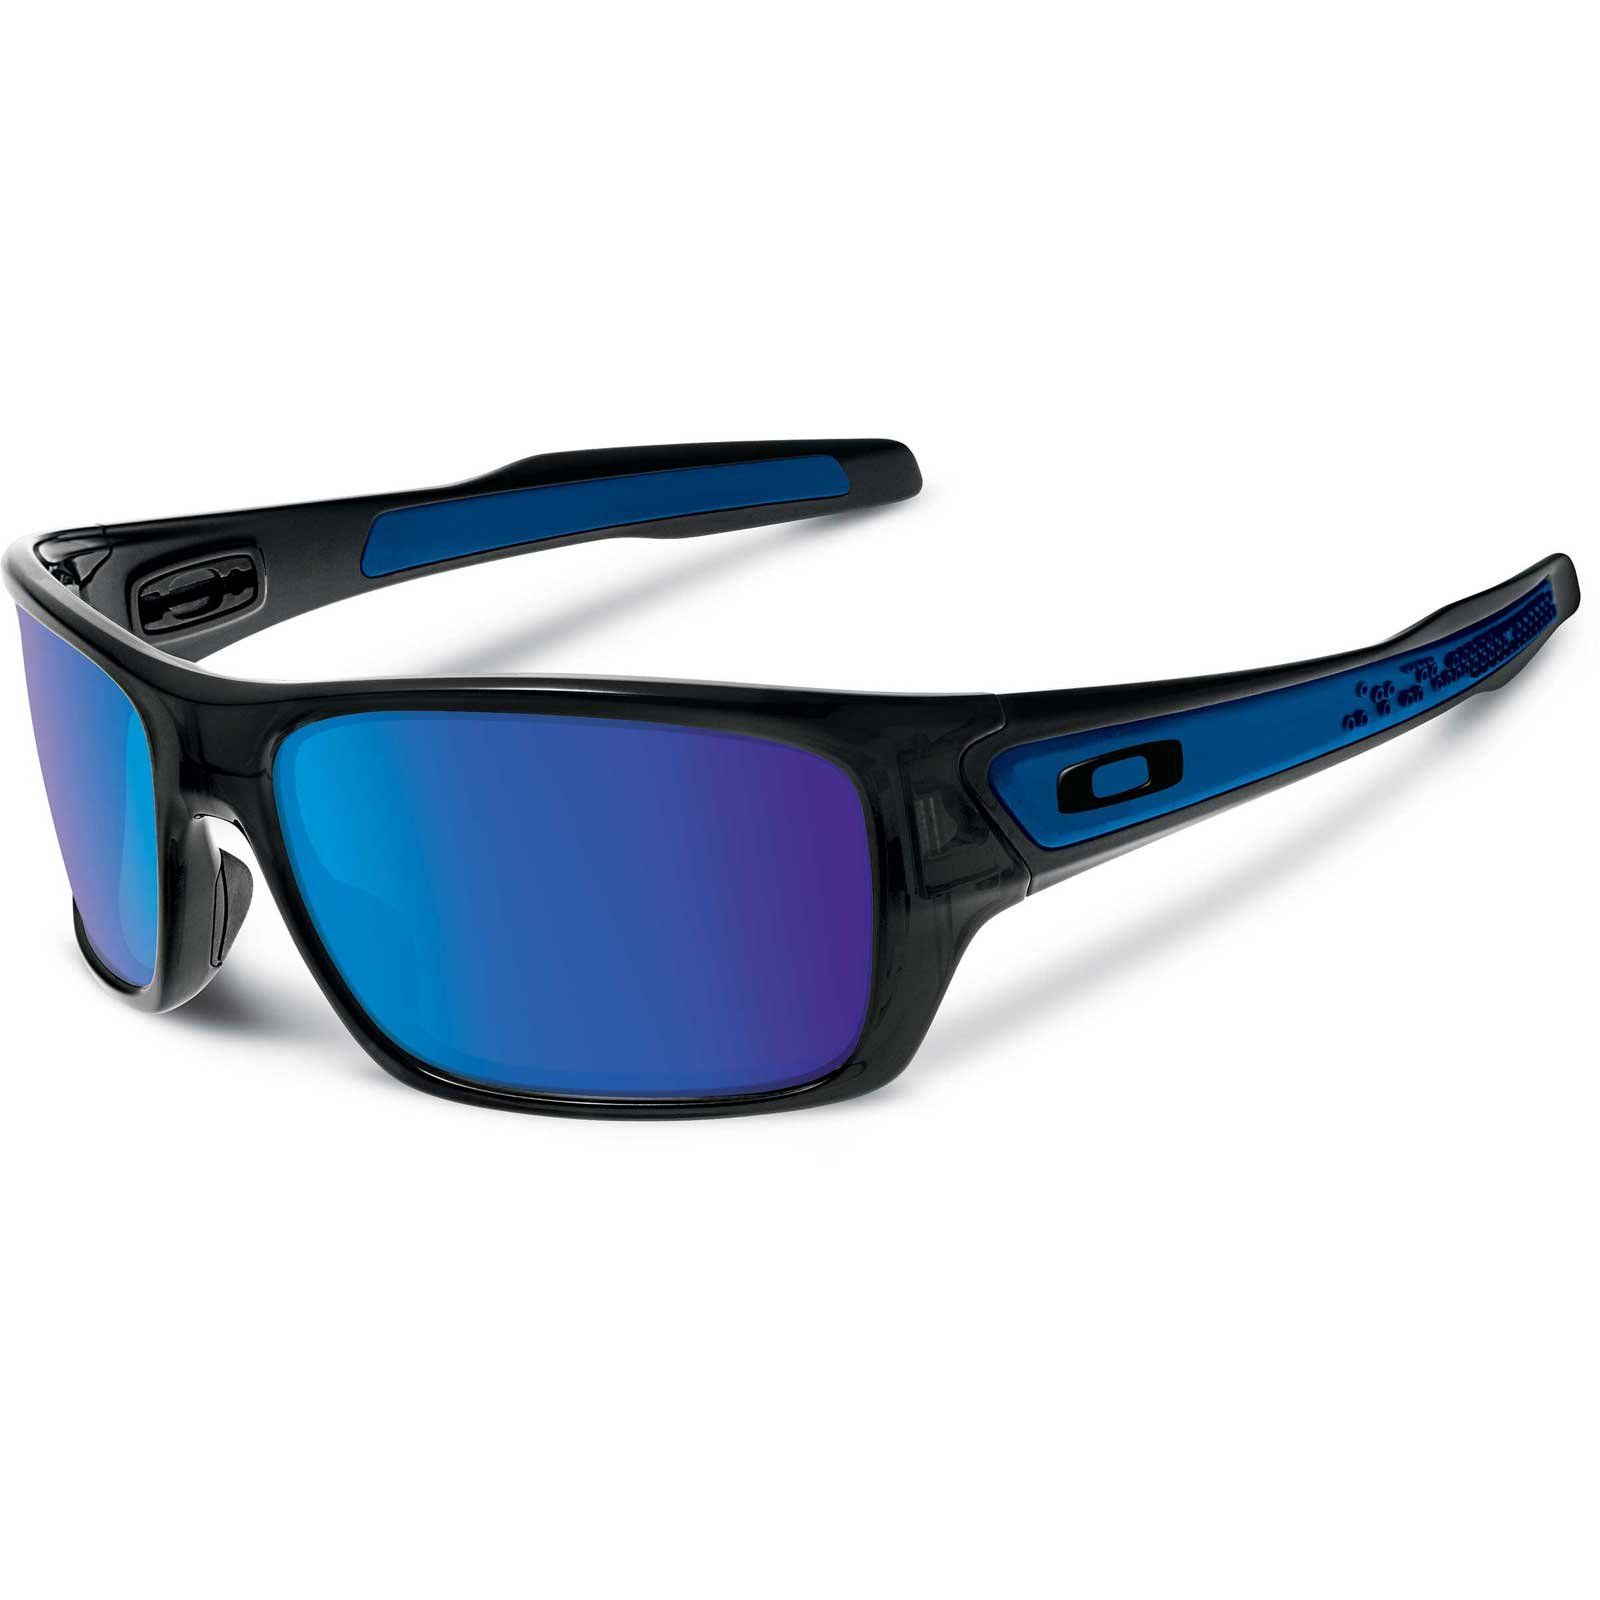 79c9a6c527 Oakley Men s Turbine OO9263-05 Iridium Rectangular Sunglasses